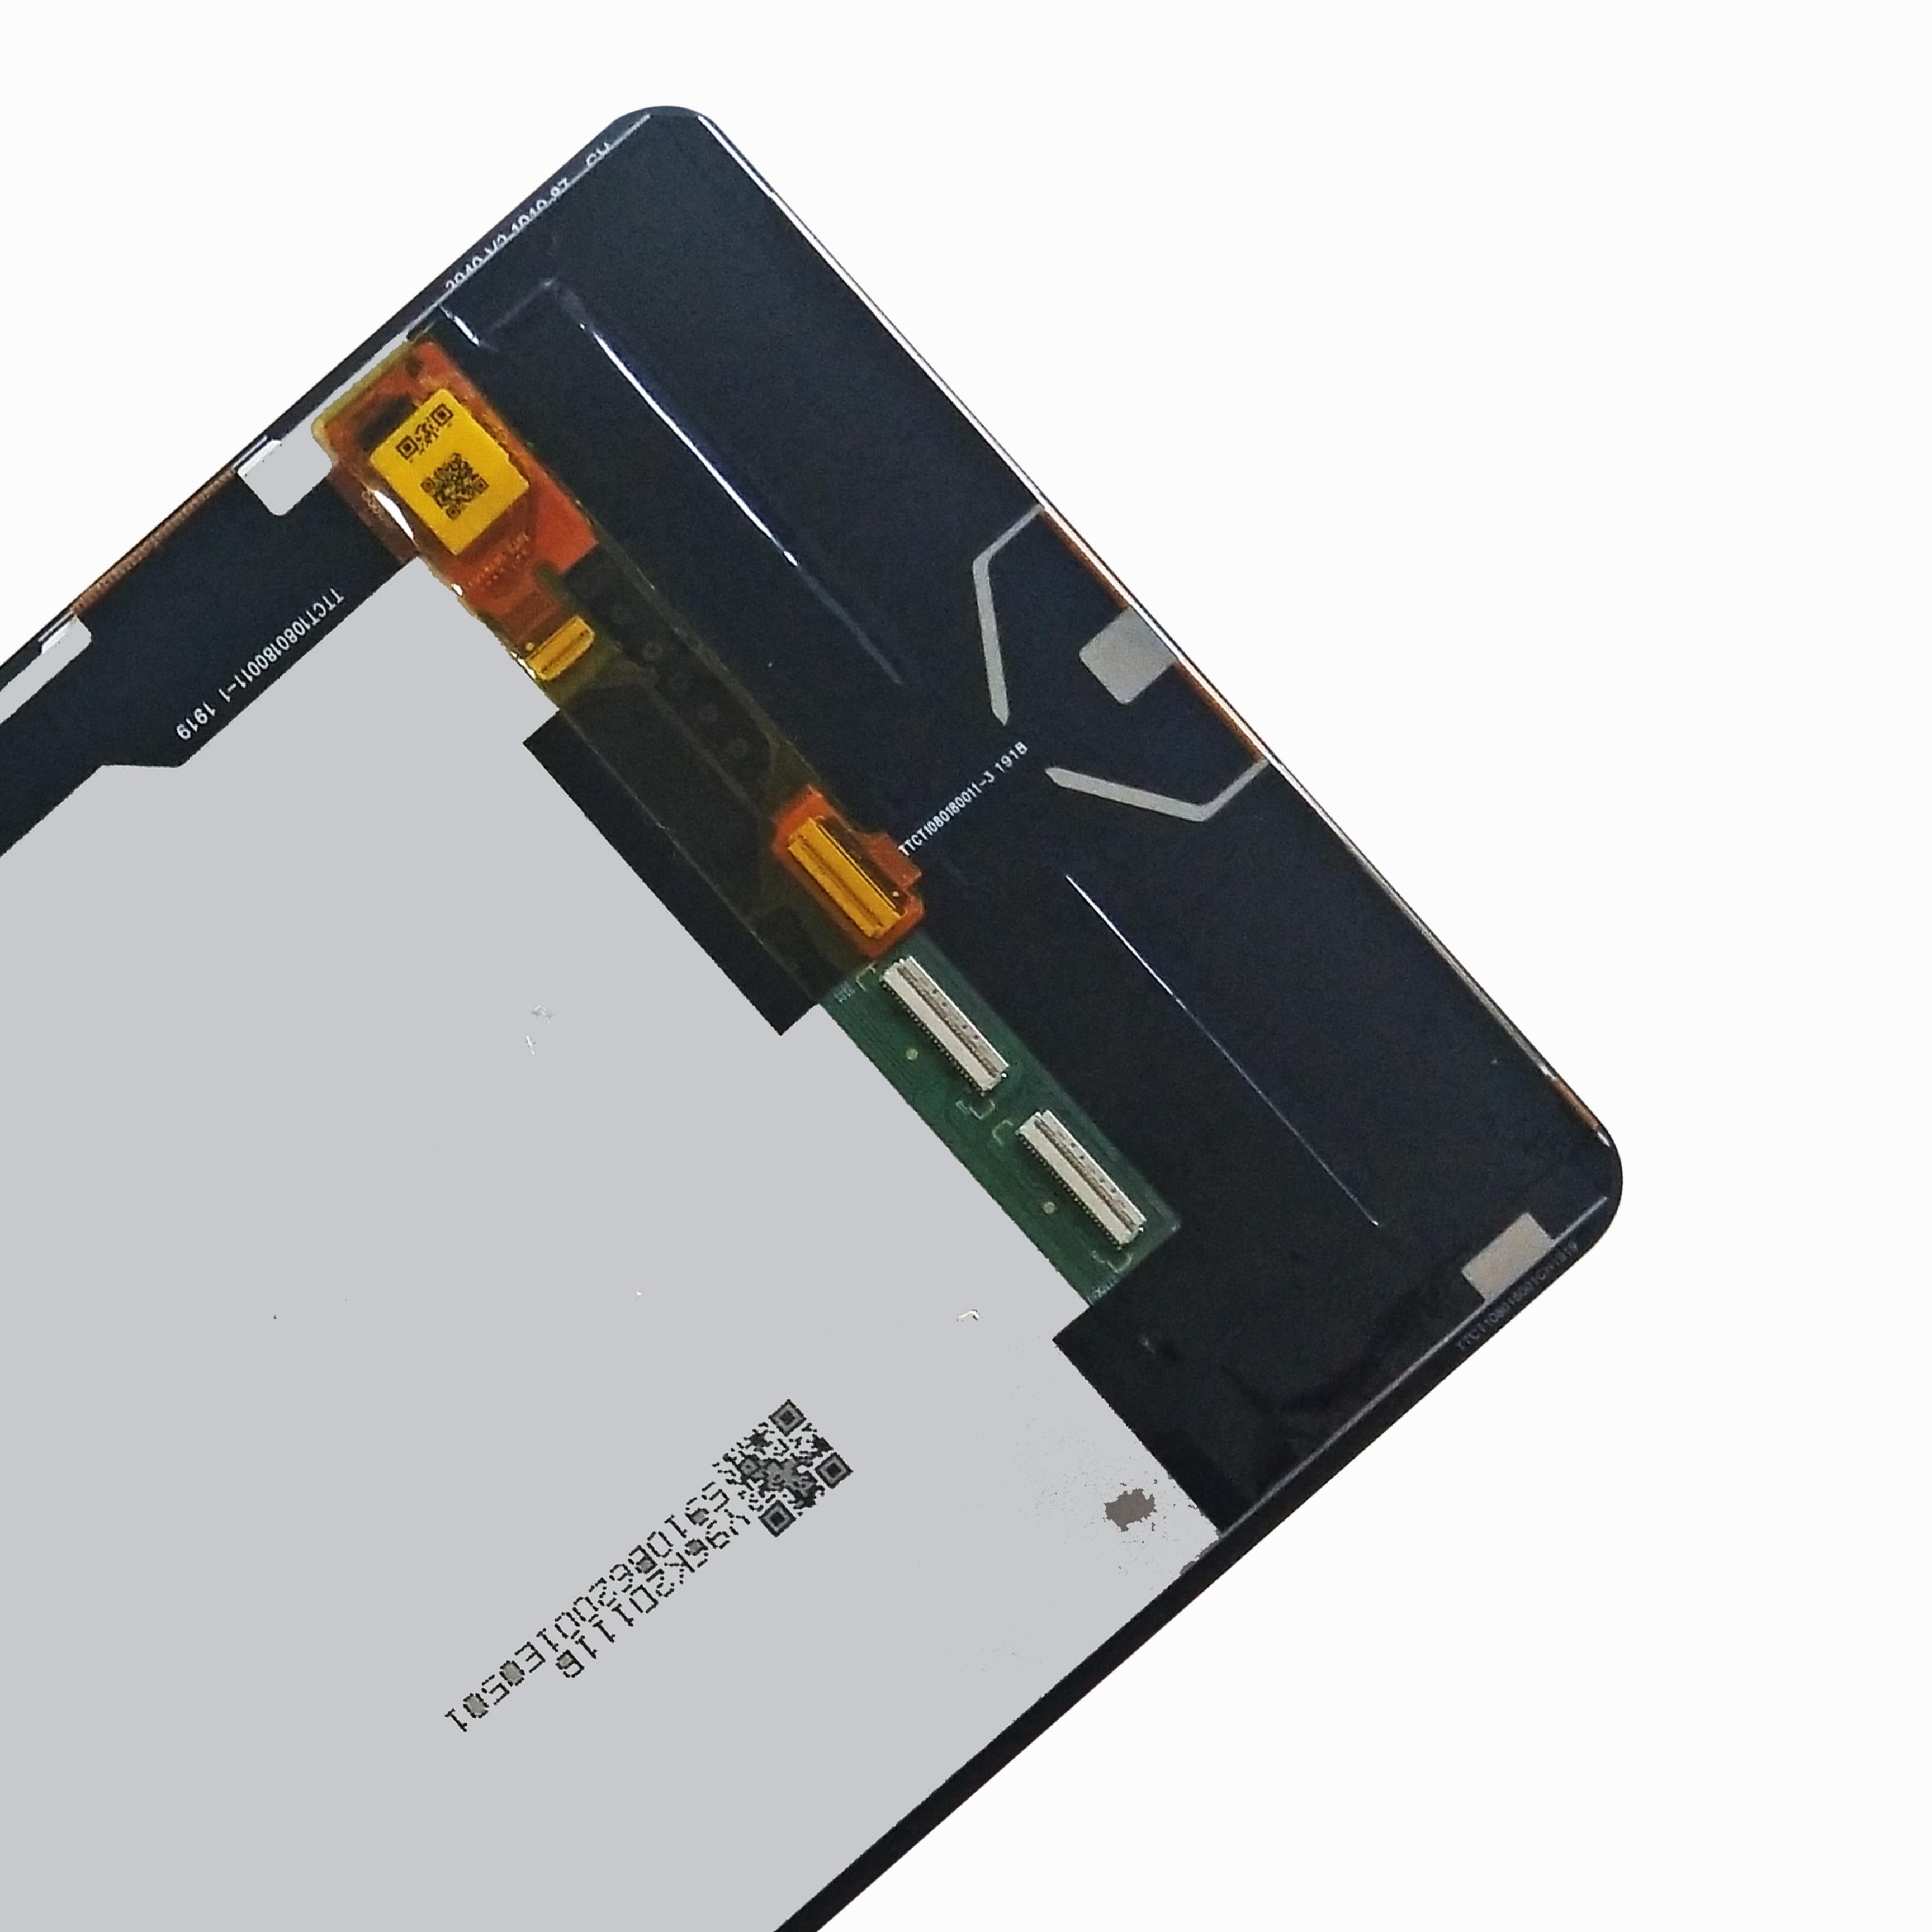 Originale 10.8 per Huawei Matepad Pro MRX W09 MRX W19 MRX AL19 MRX AL09 Display Lcd con Touch Screen Digitizer Assembly - 6